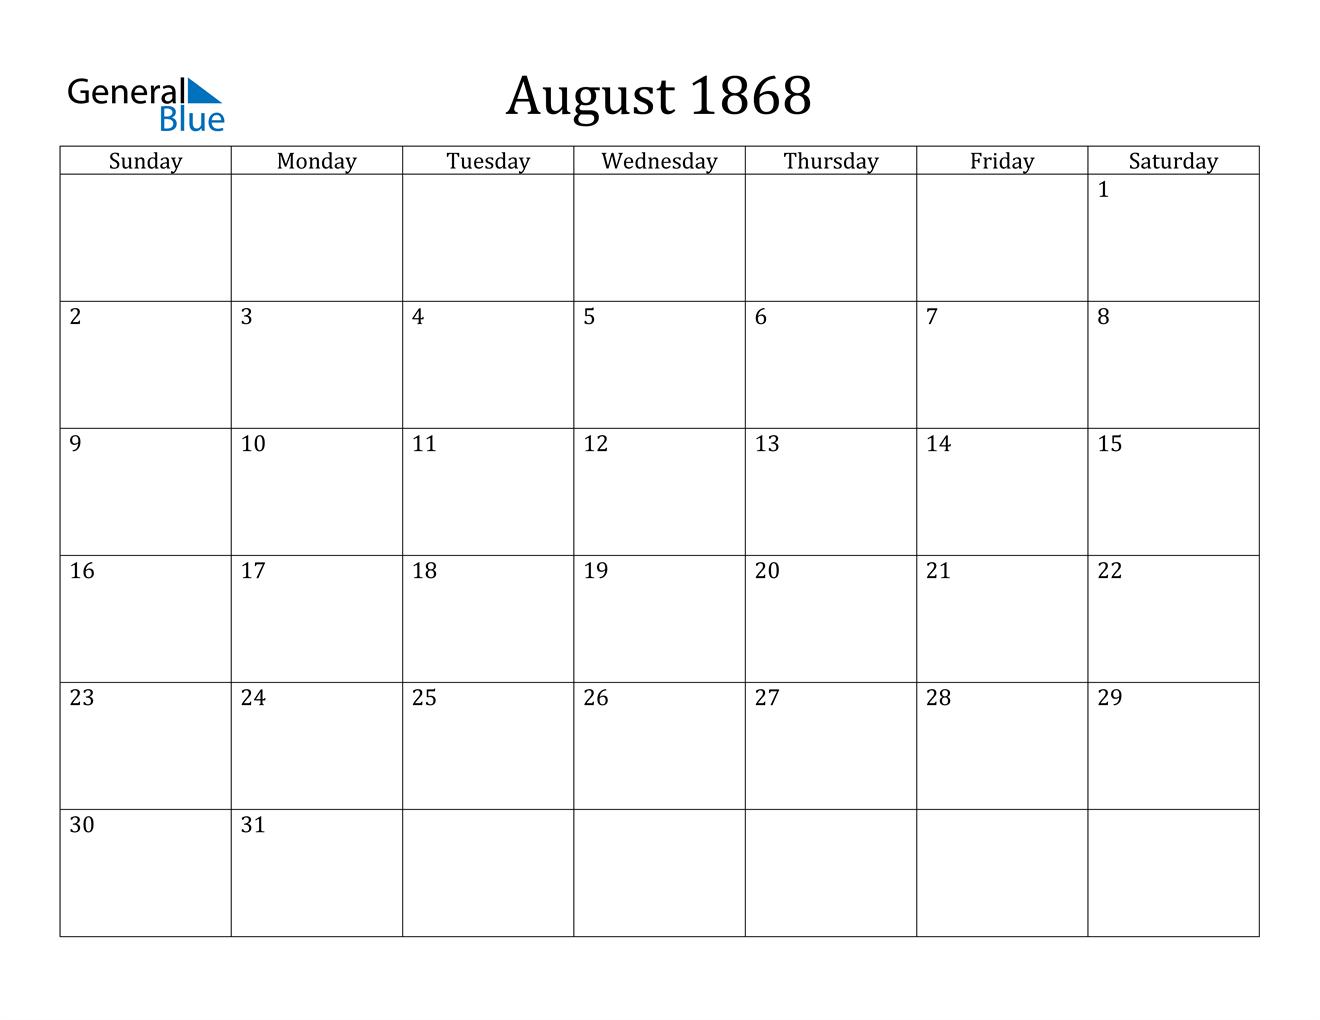 Image of August 1868 Calendar